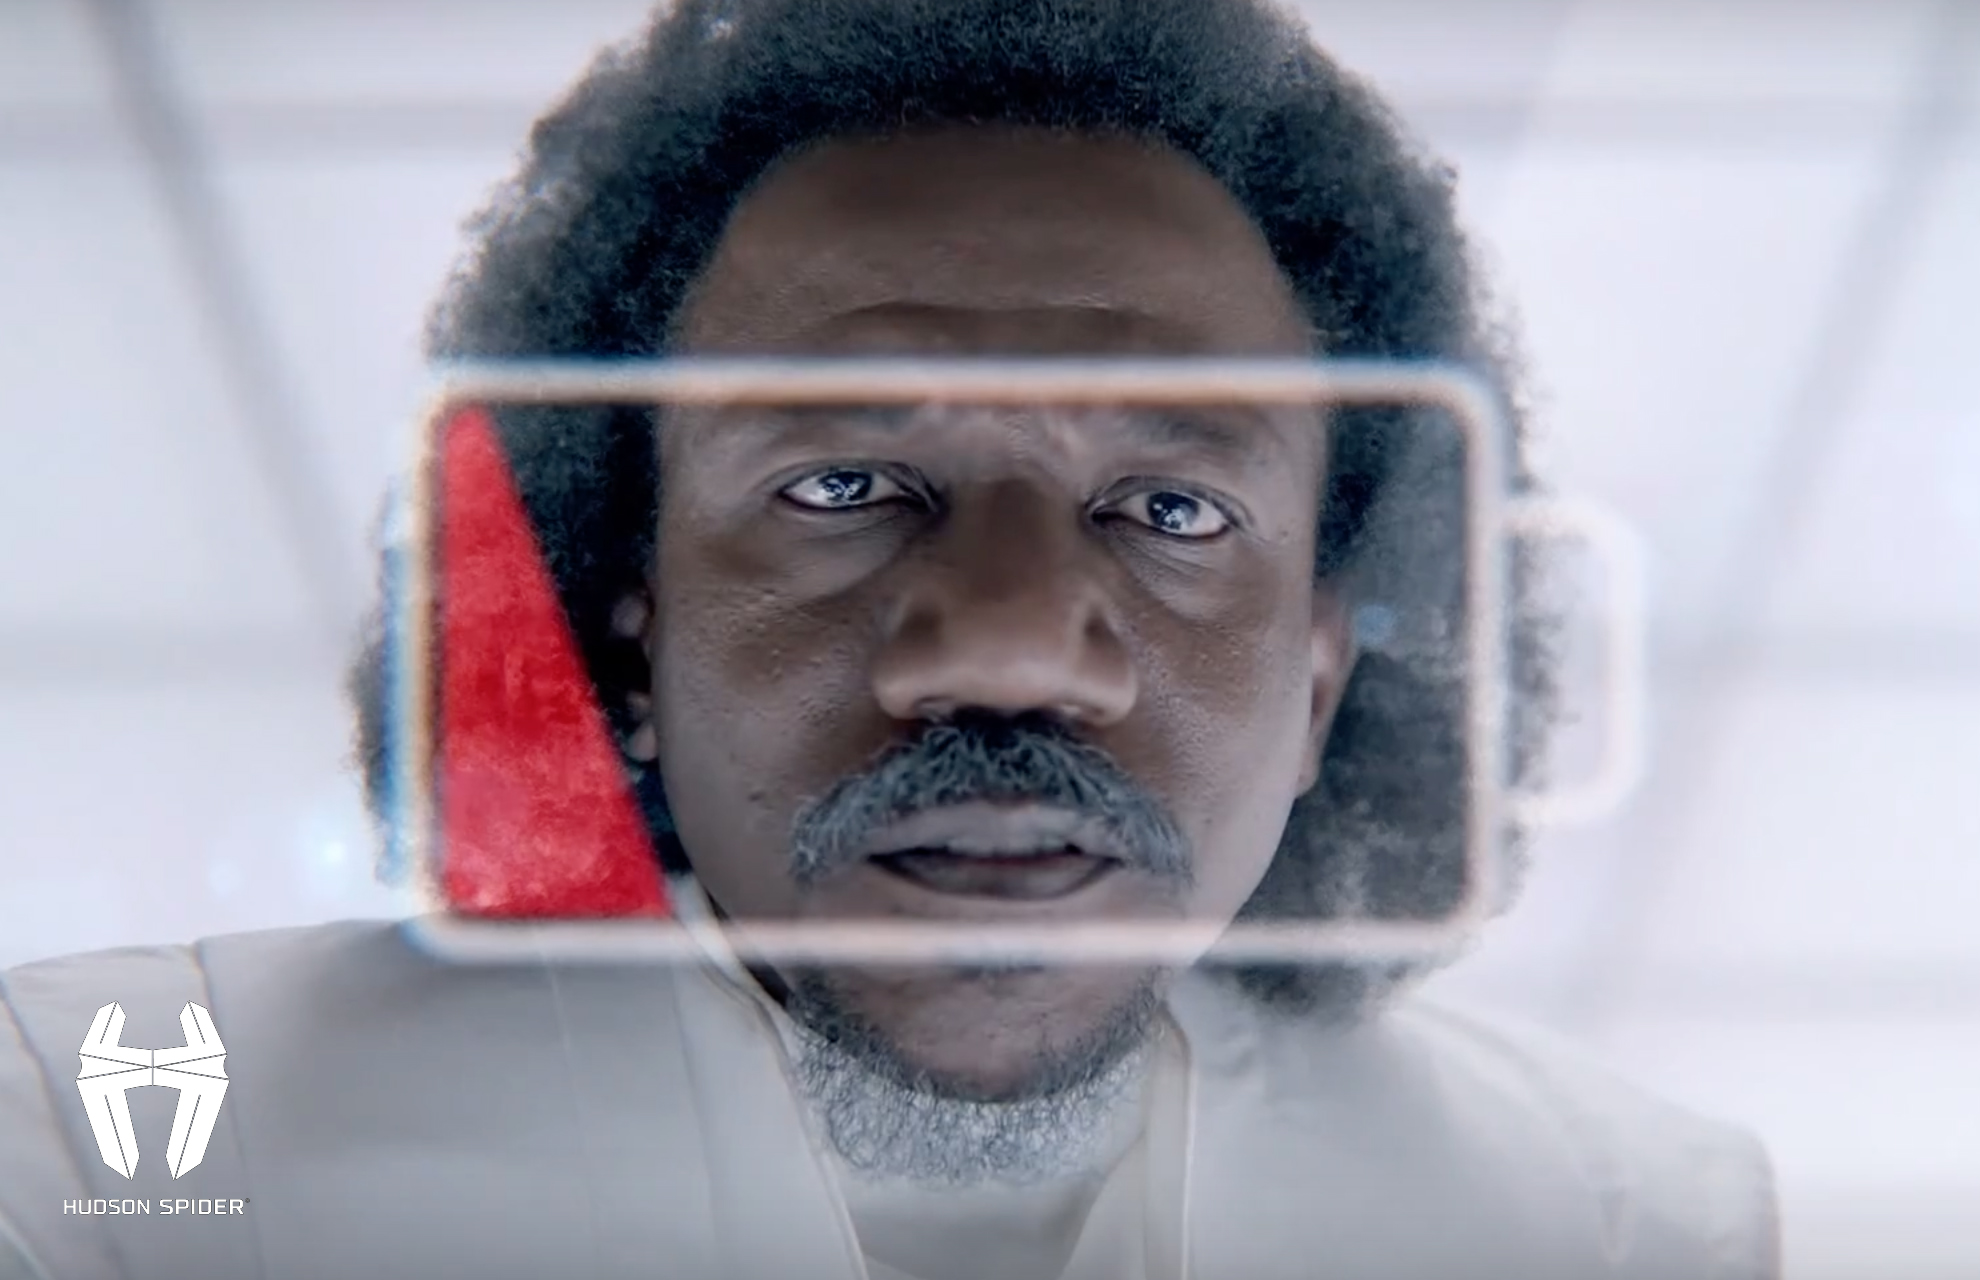 Mophie Super Bowl commercial